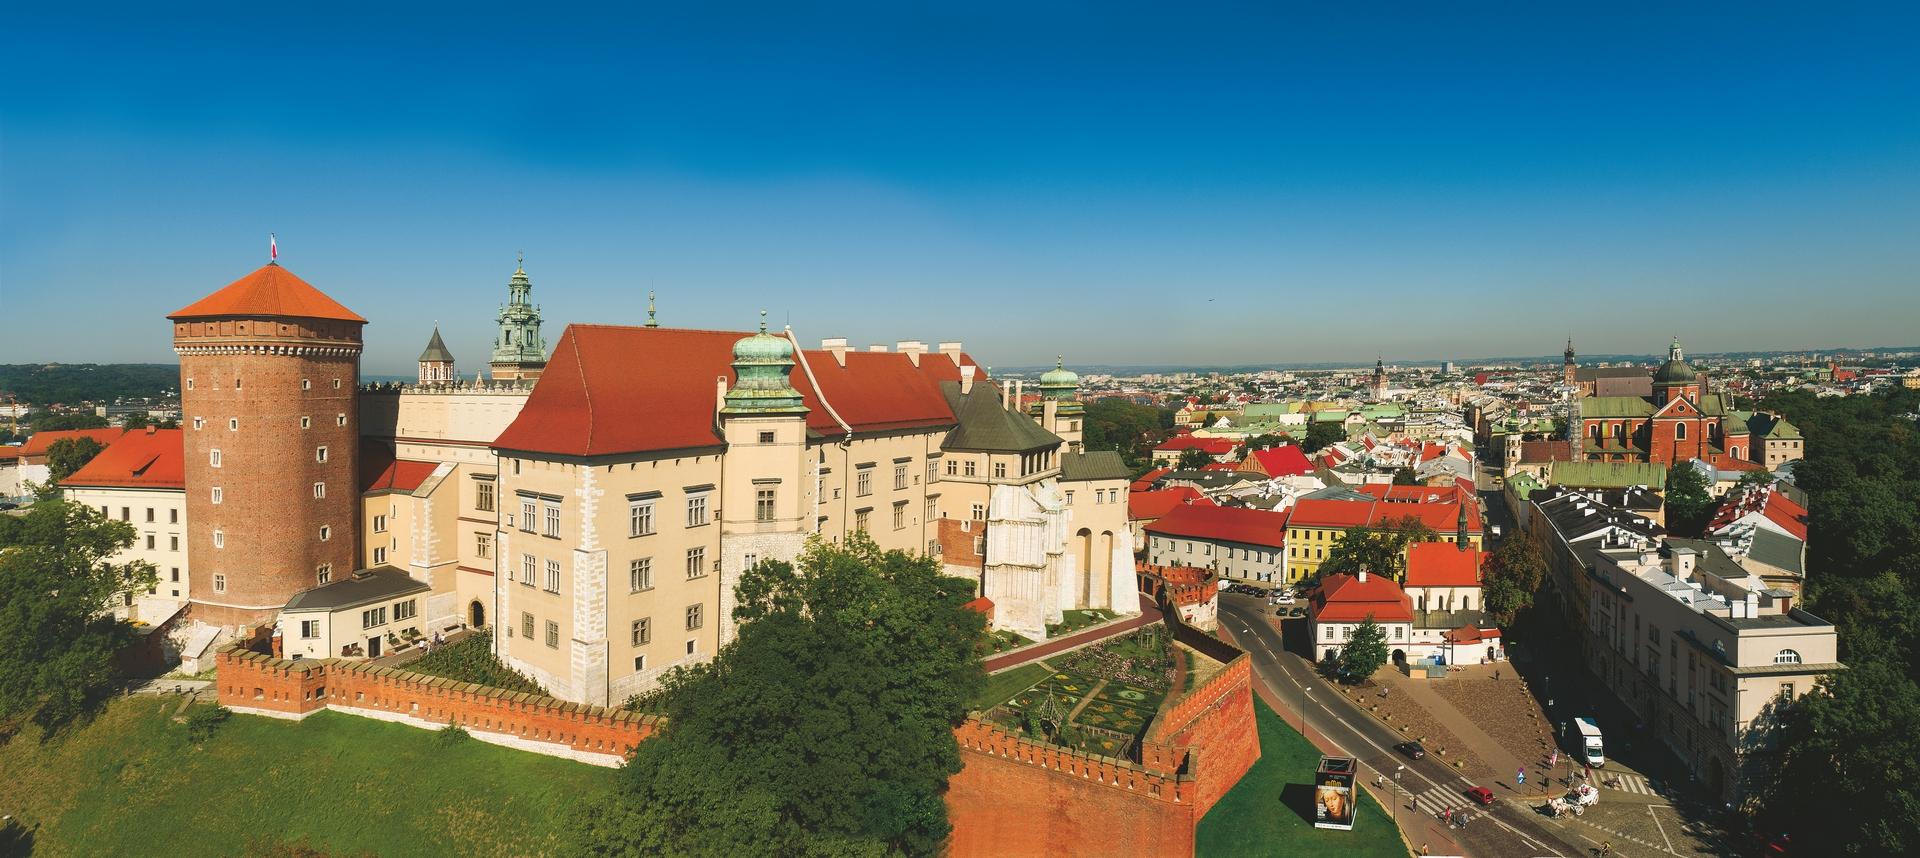 Wawel, Kraków